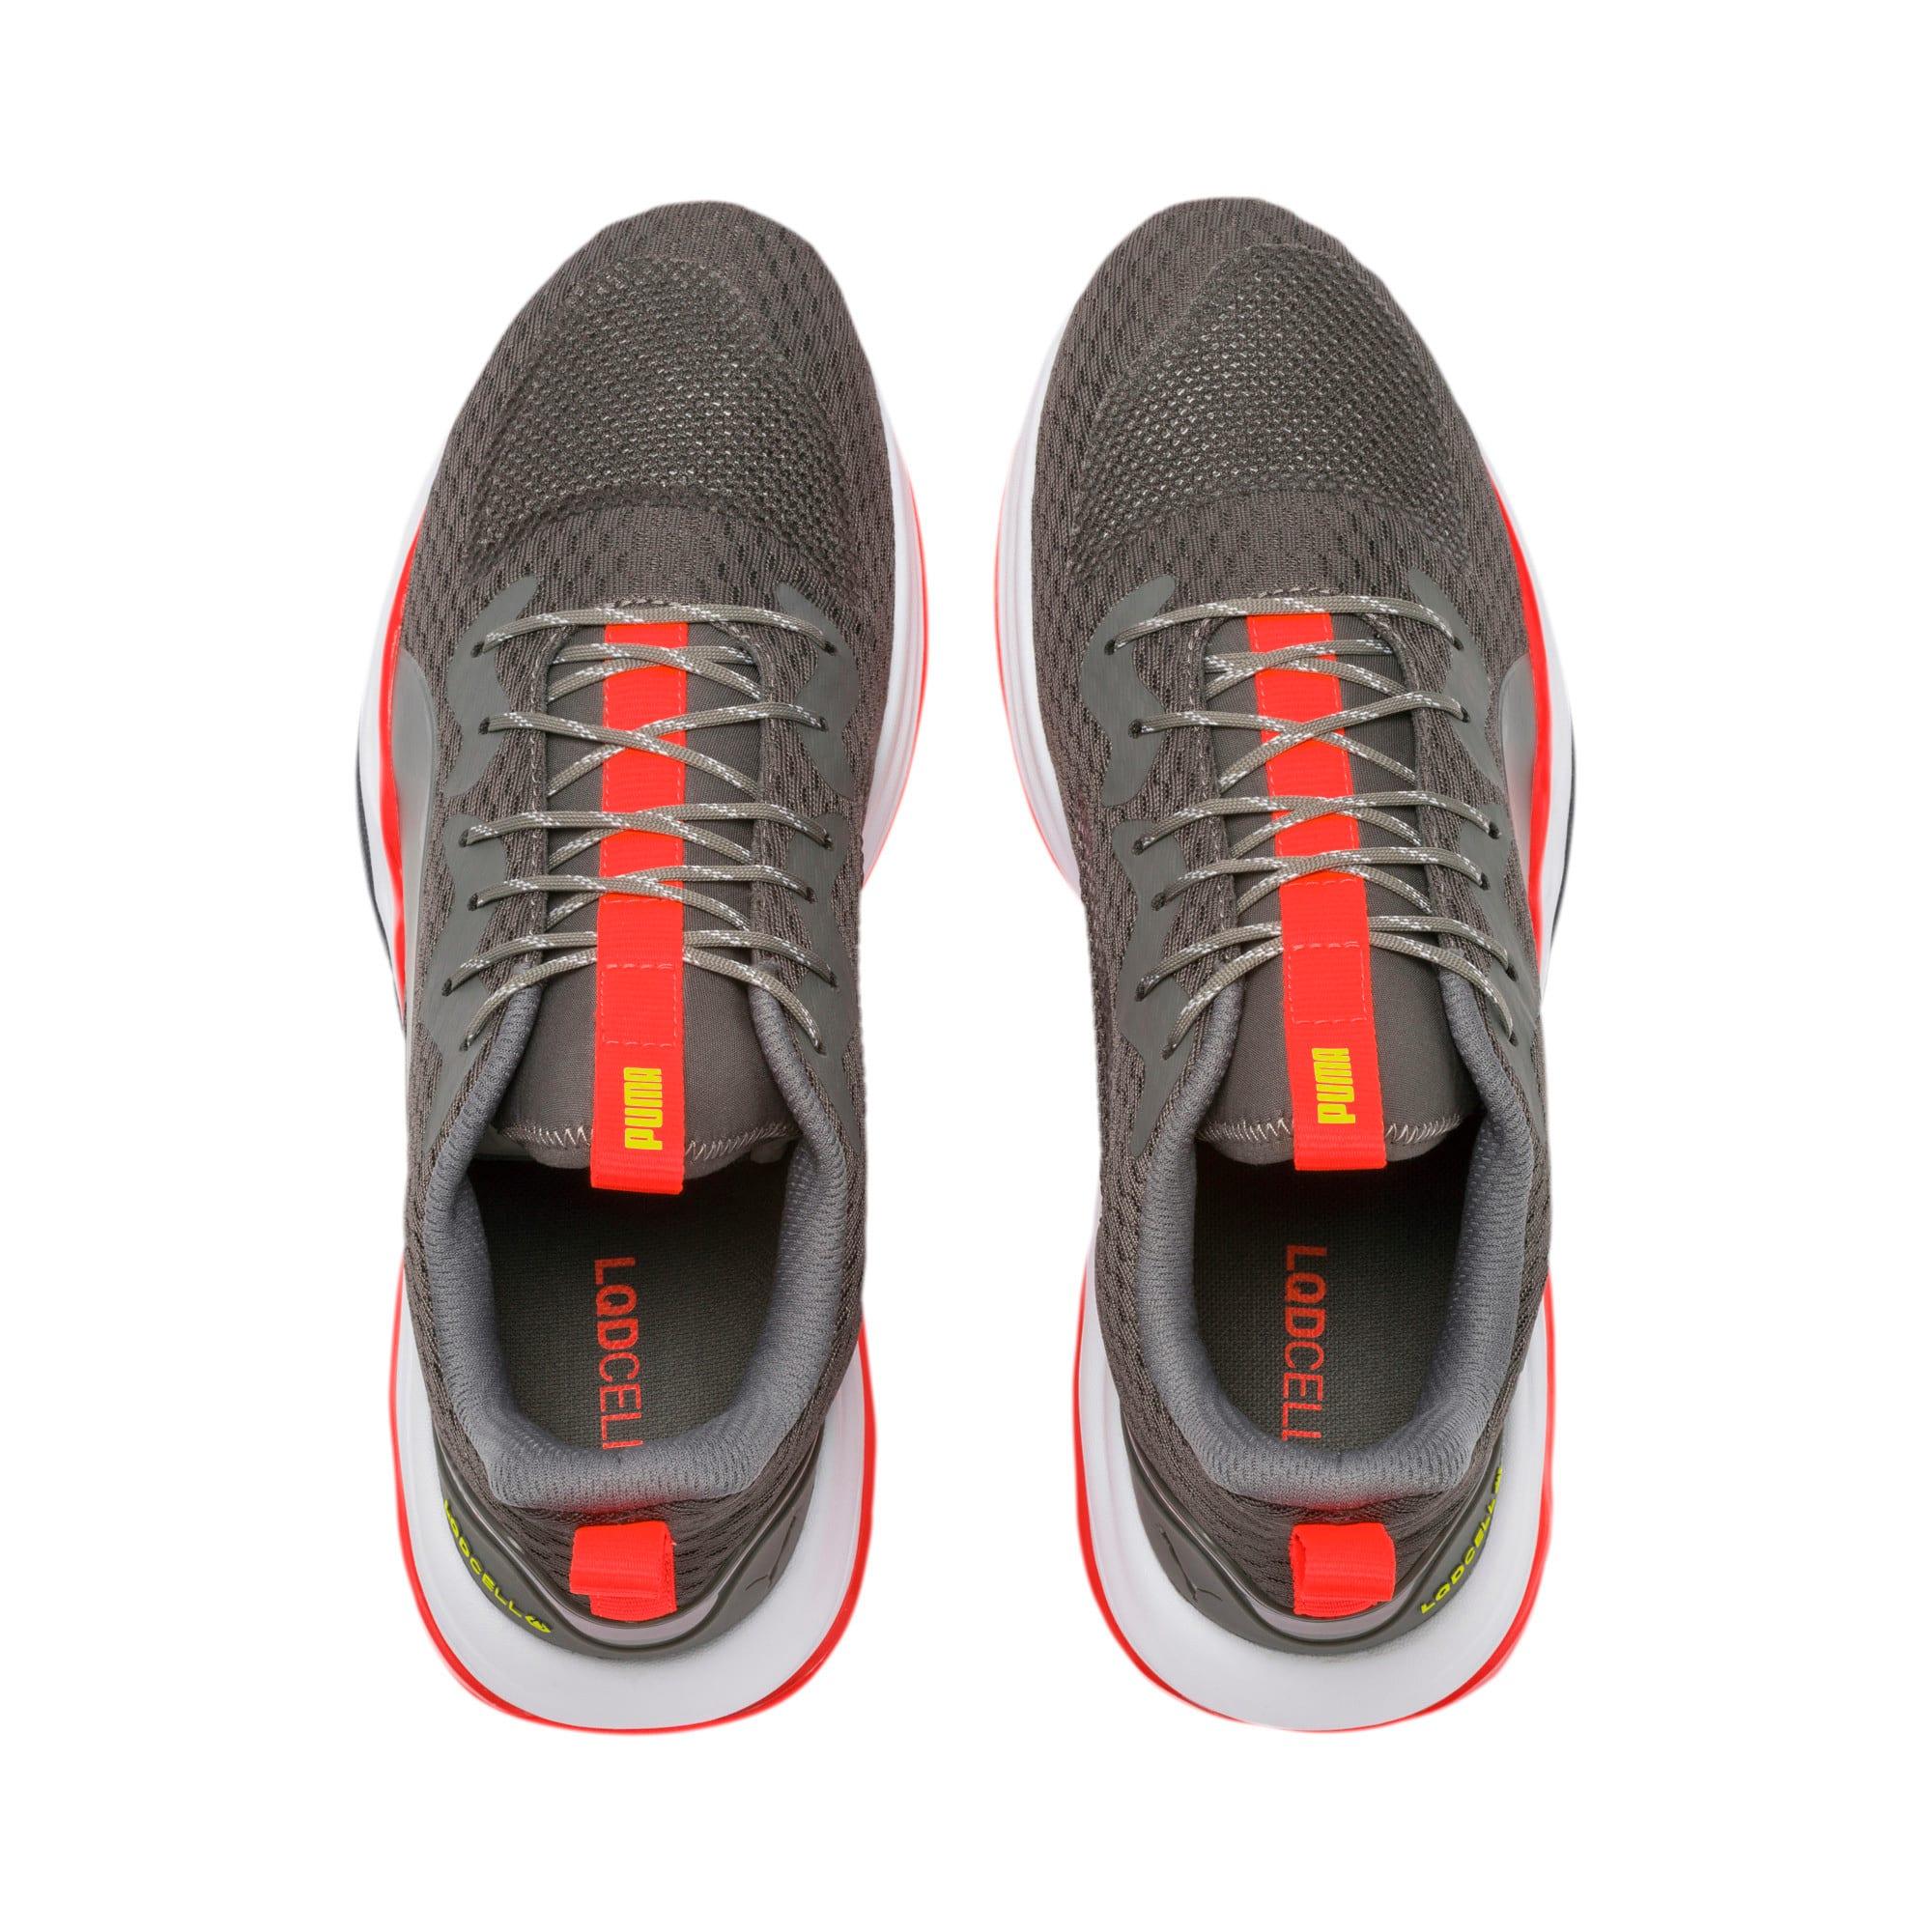 Thumbnail 8 of LQDCELL Tension Men's Training Shoes, CASTLEROCK-Nrgy Red-Y Alert, medium